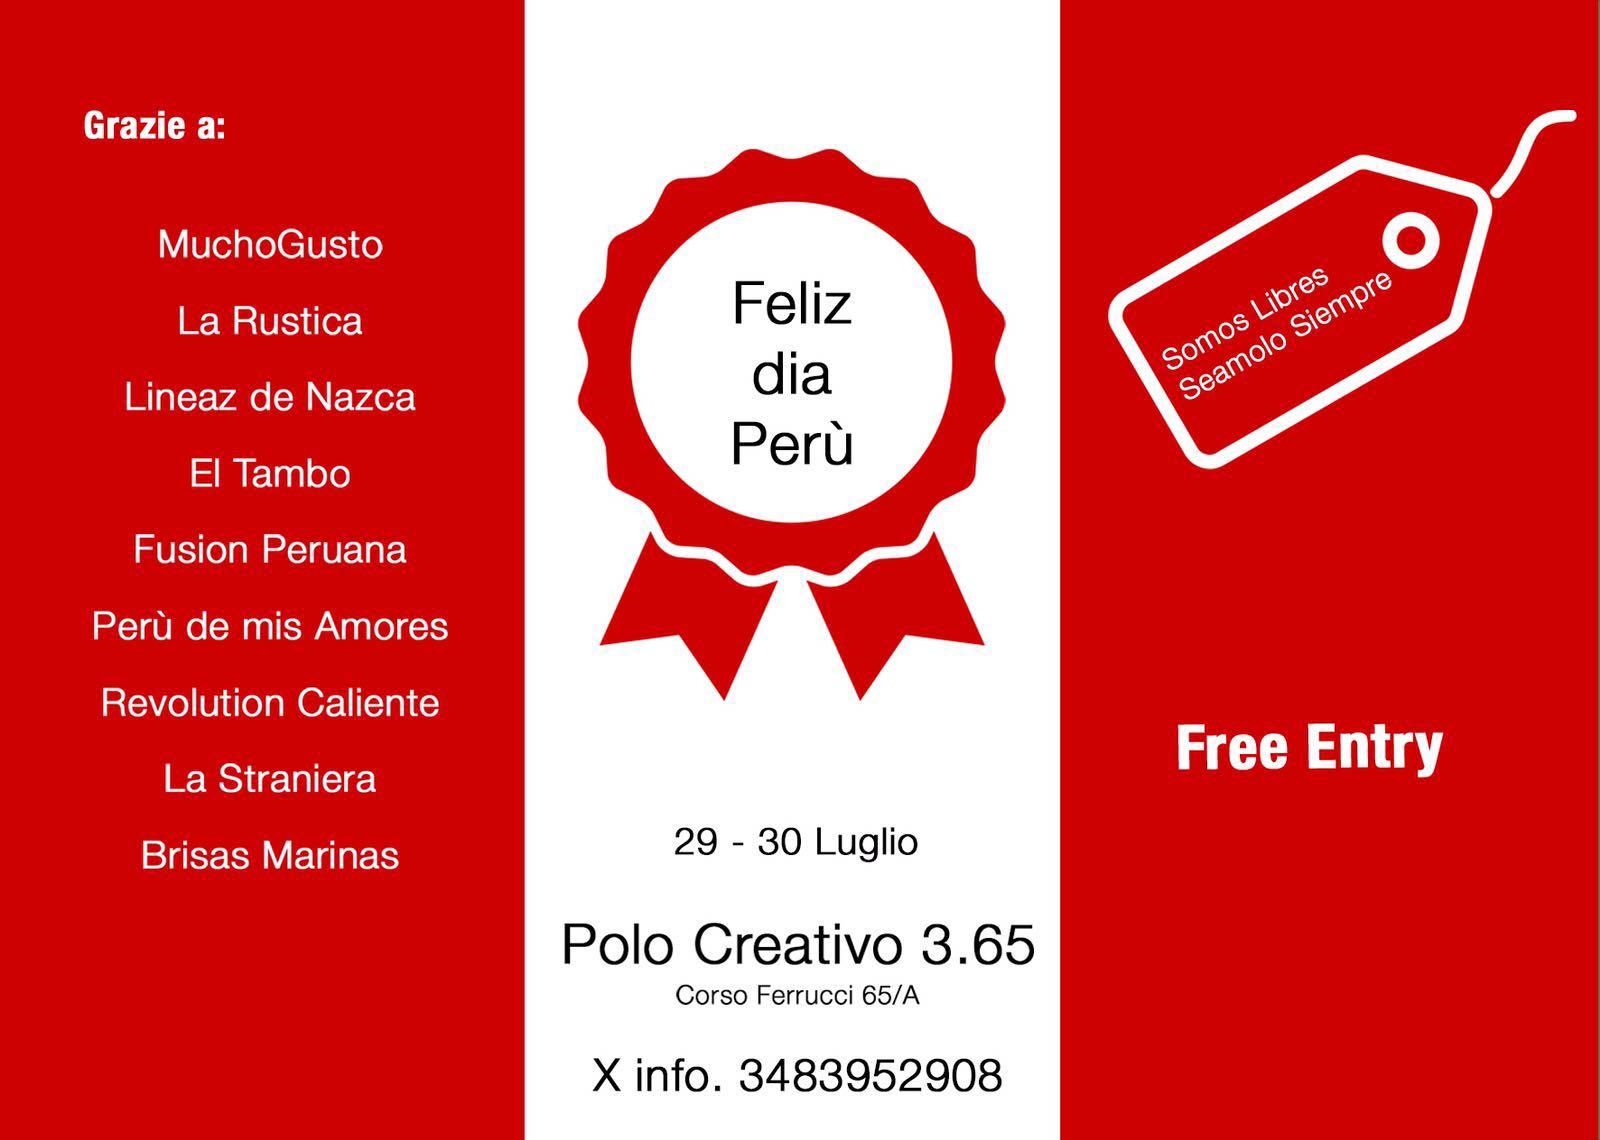 Feliz d a per esperto estudiantes peruanos en torino for Nascondi esperto